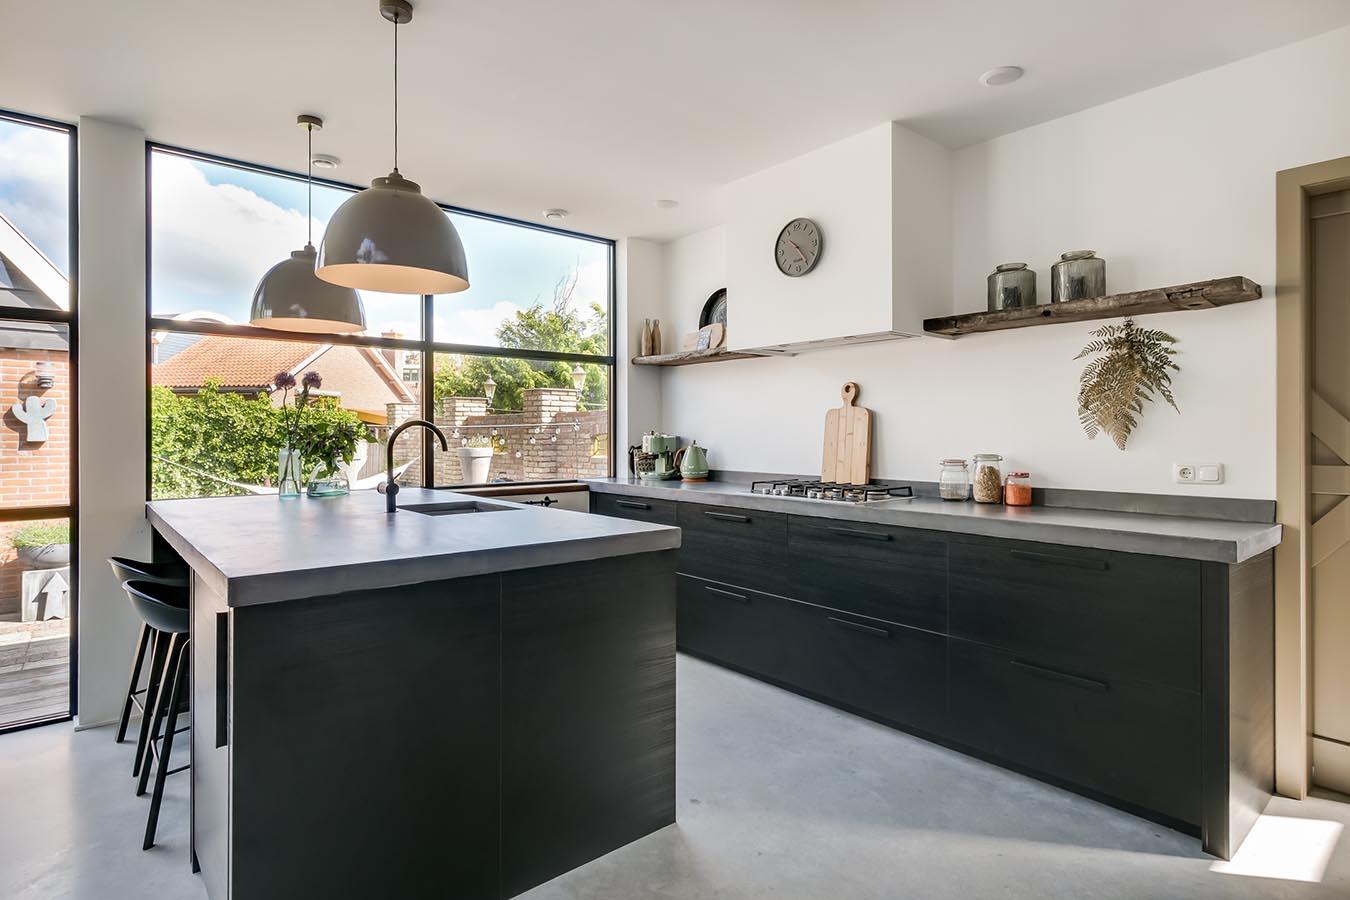 Moderne keuken deel 2